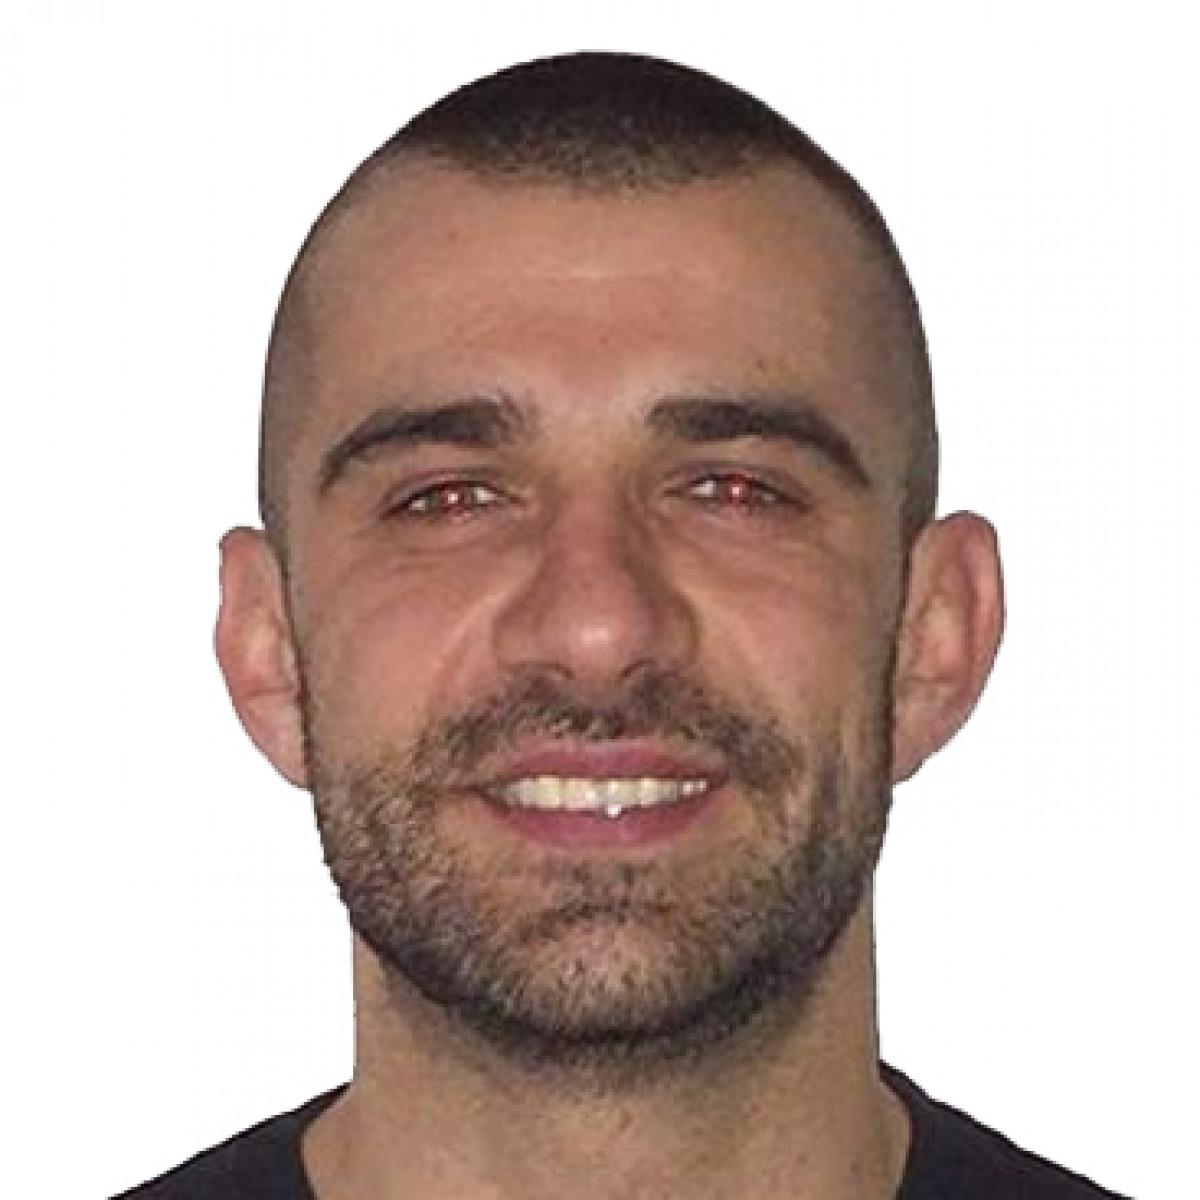 Mihail Tanev